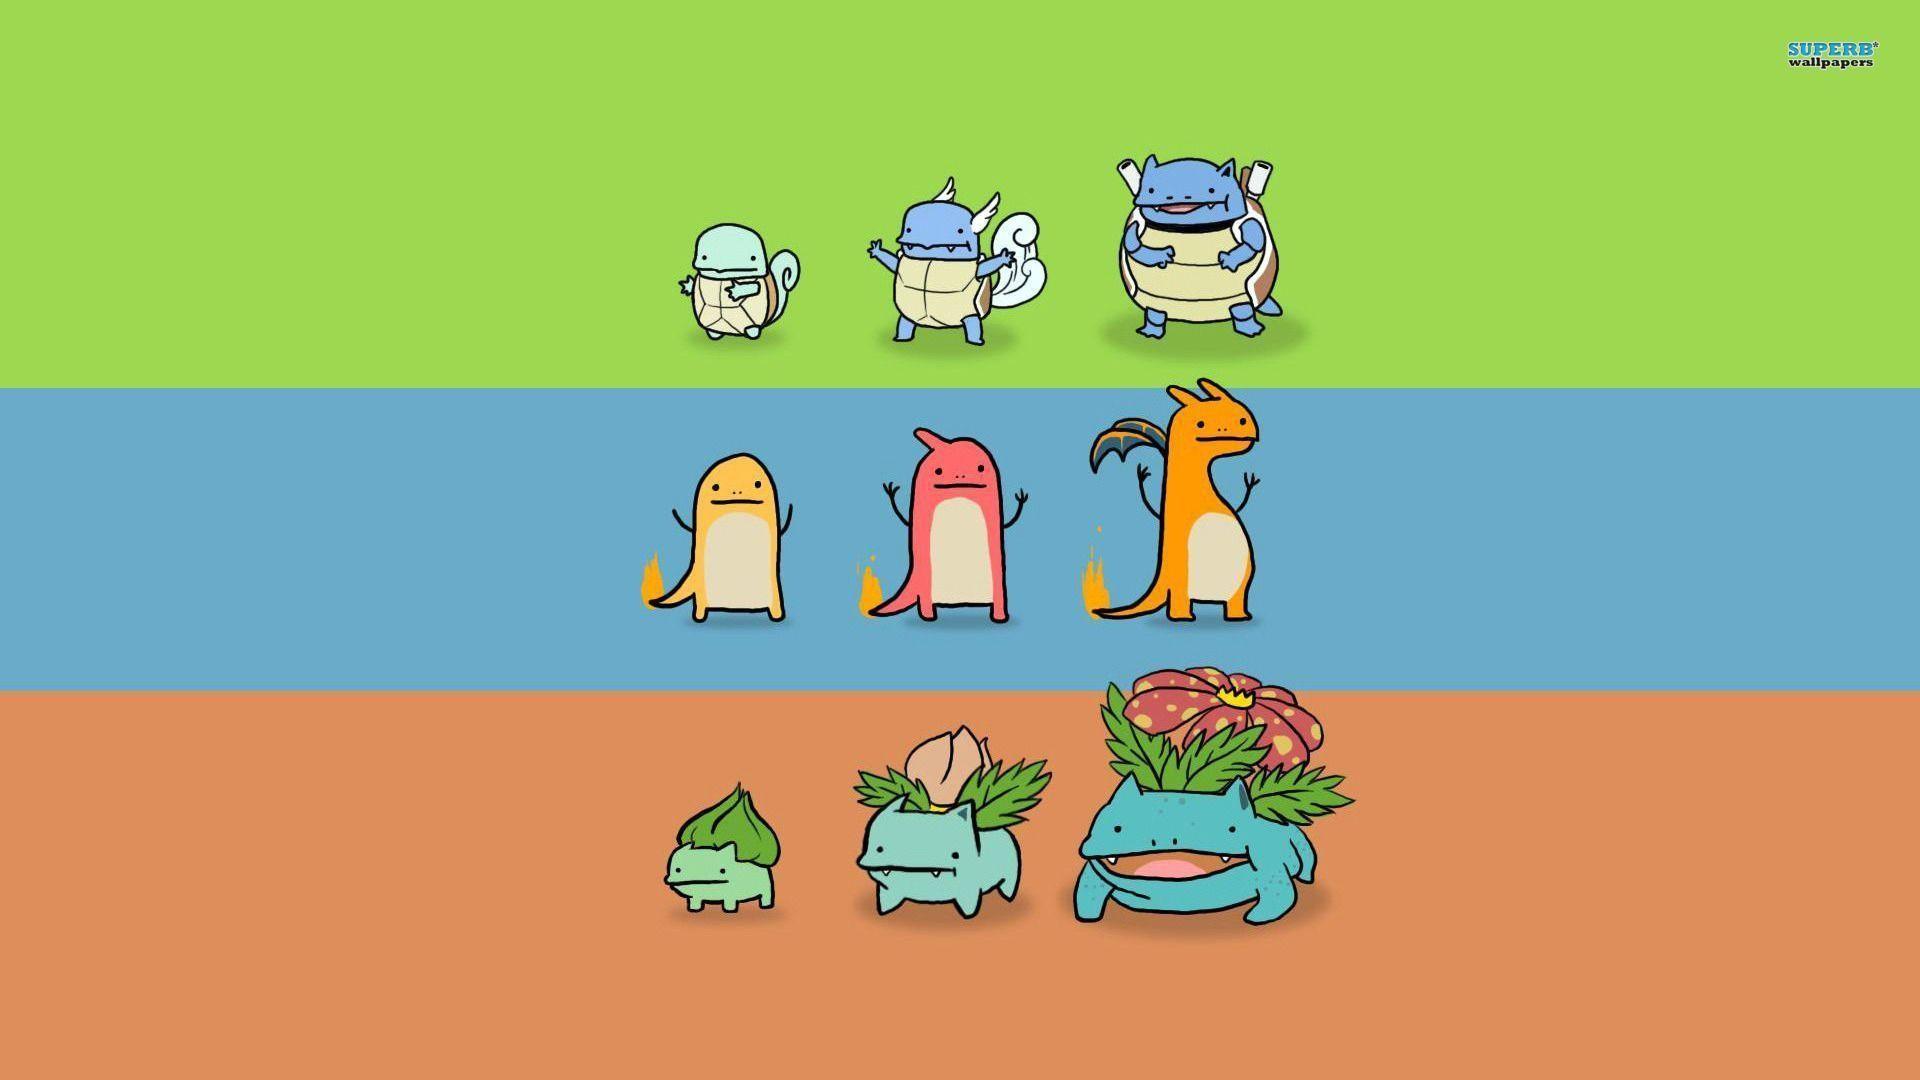 Eevee Pokemon Wallpaper | Eeveelution | Pinterest | Pokémon and .